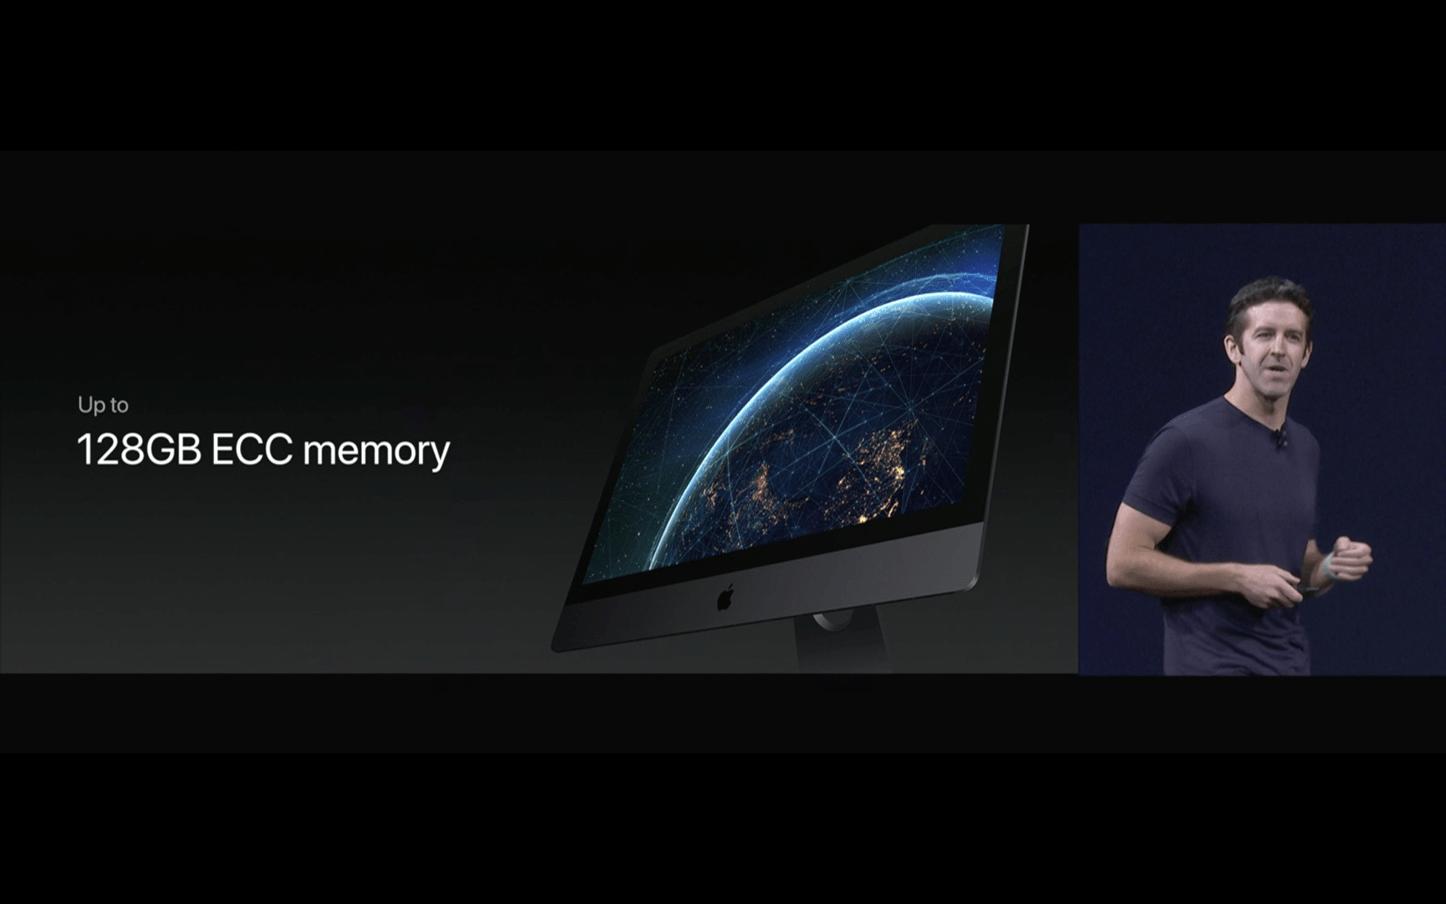 iMac-Pro-2017-WWDC17-17.png